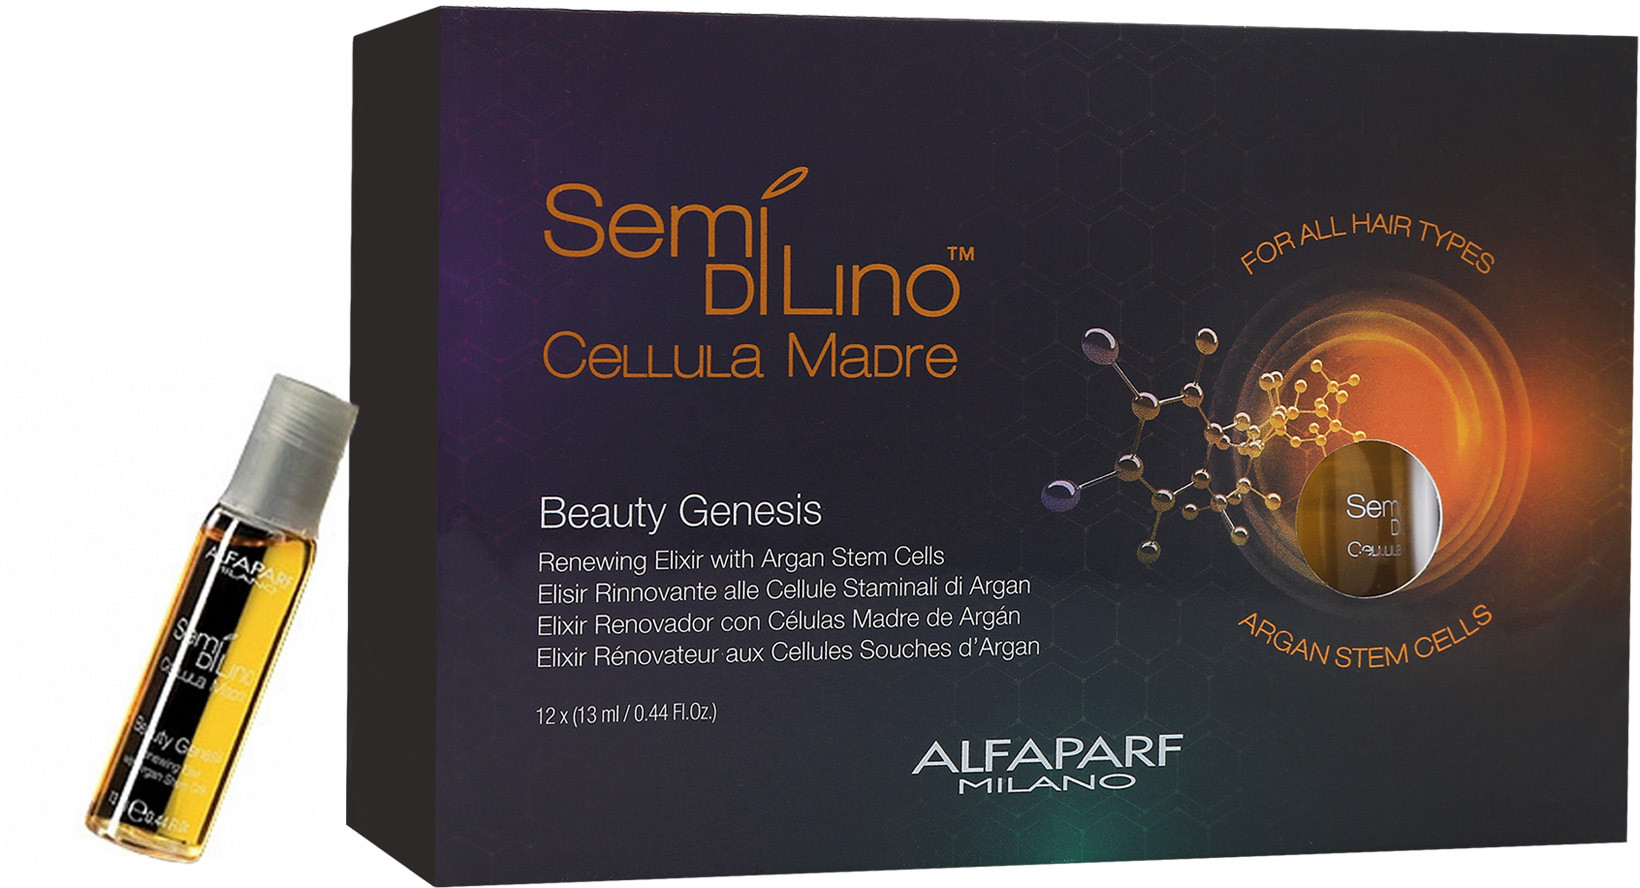 Alfaparf SEMI DI LINO Cellula Madre Beauty Genesis Ampułki 12x13ml 0000061342